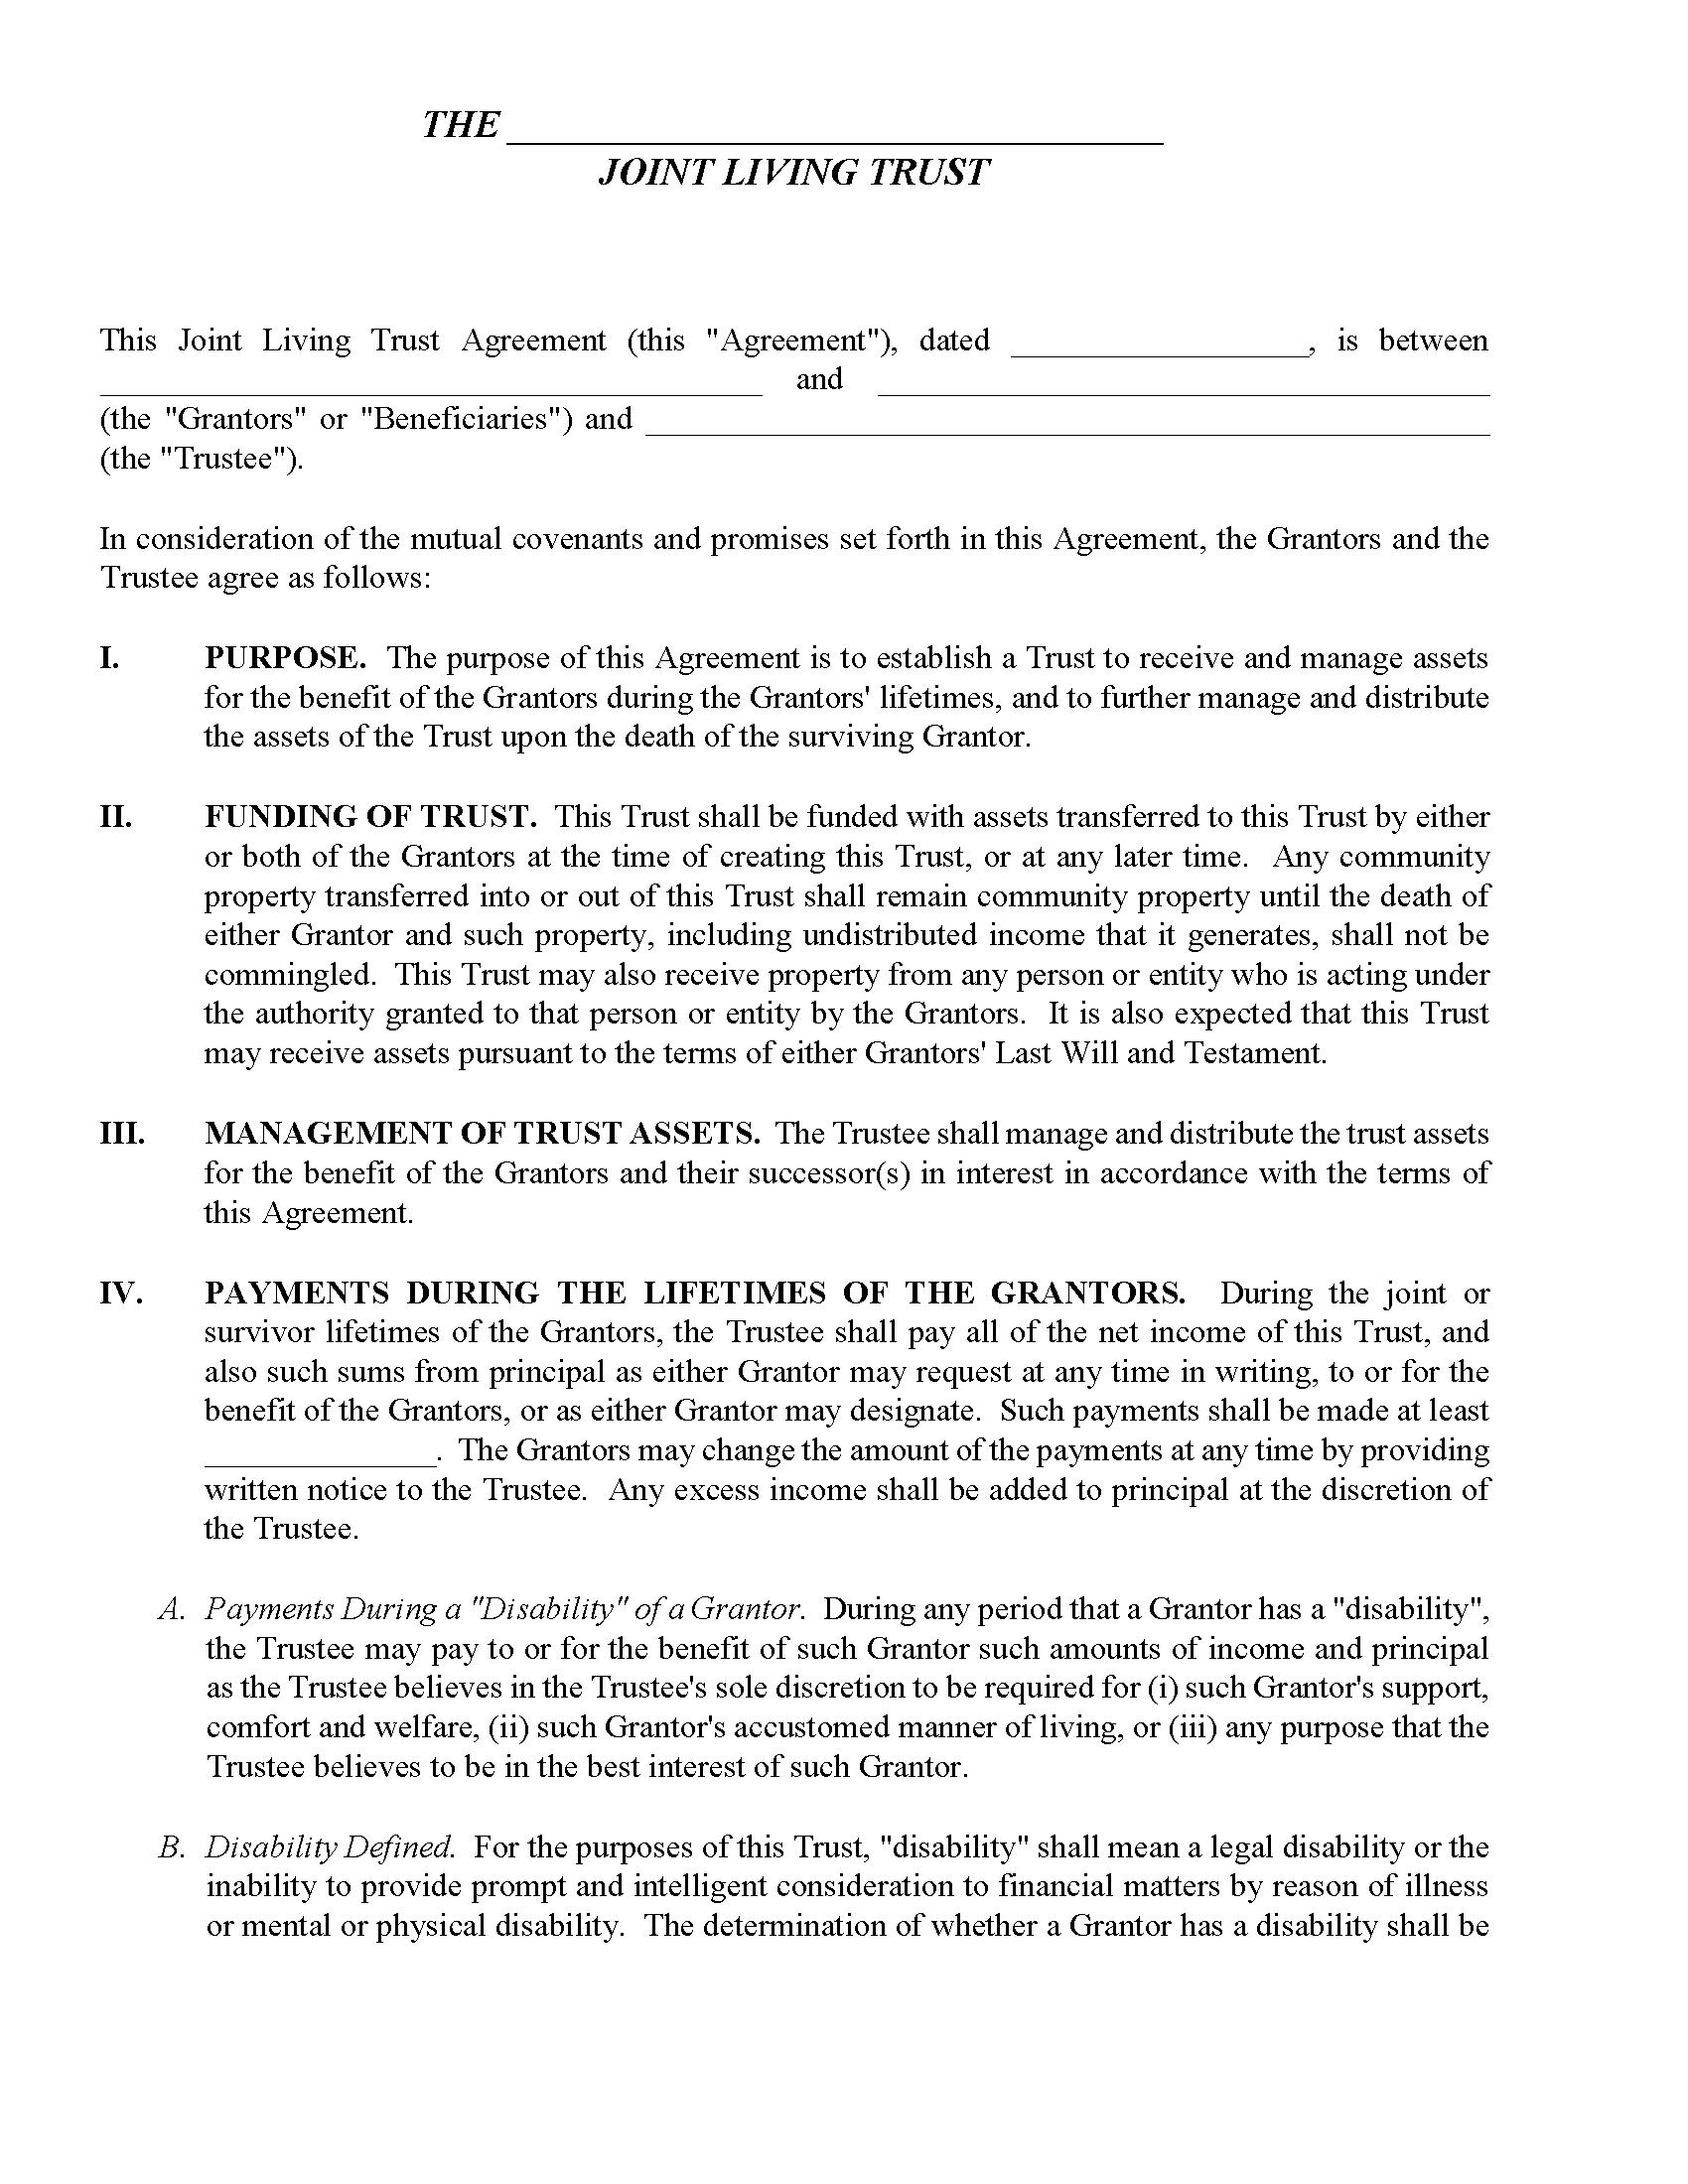 Alaska Joint Living Trust Form